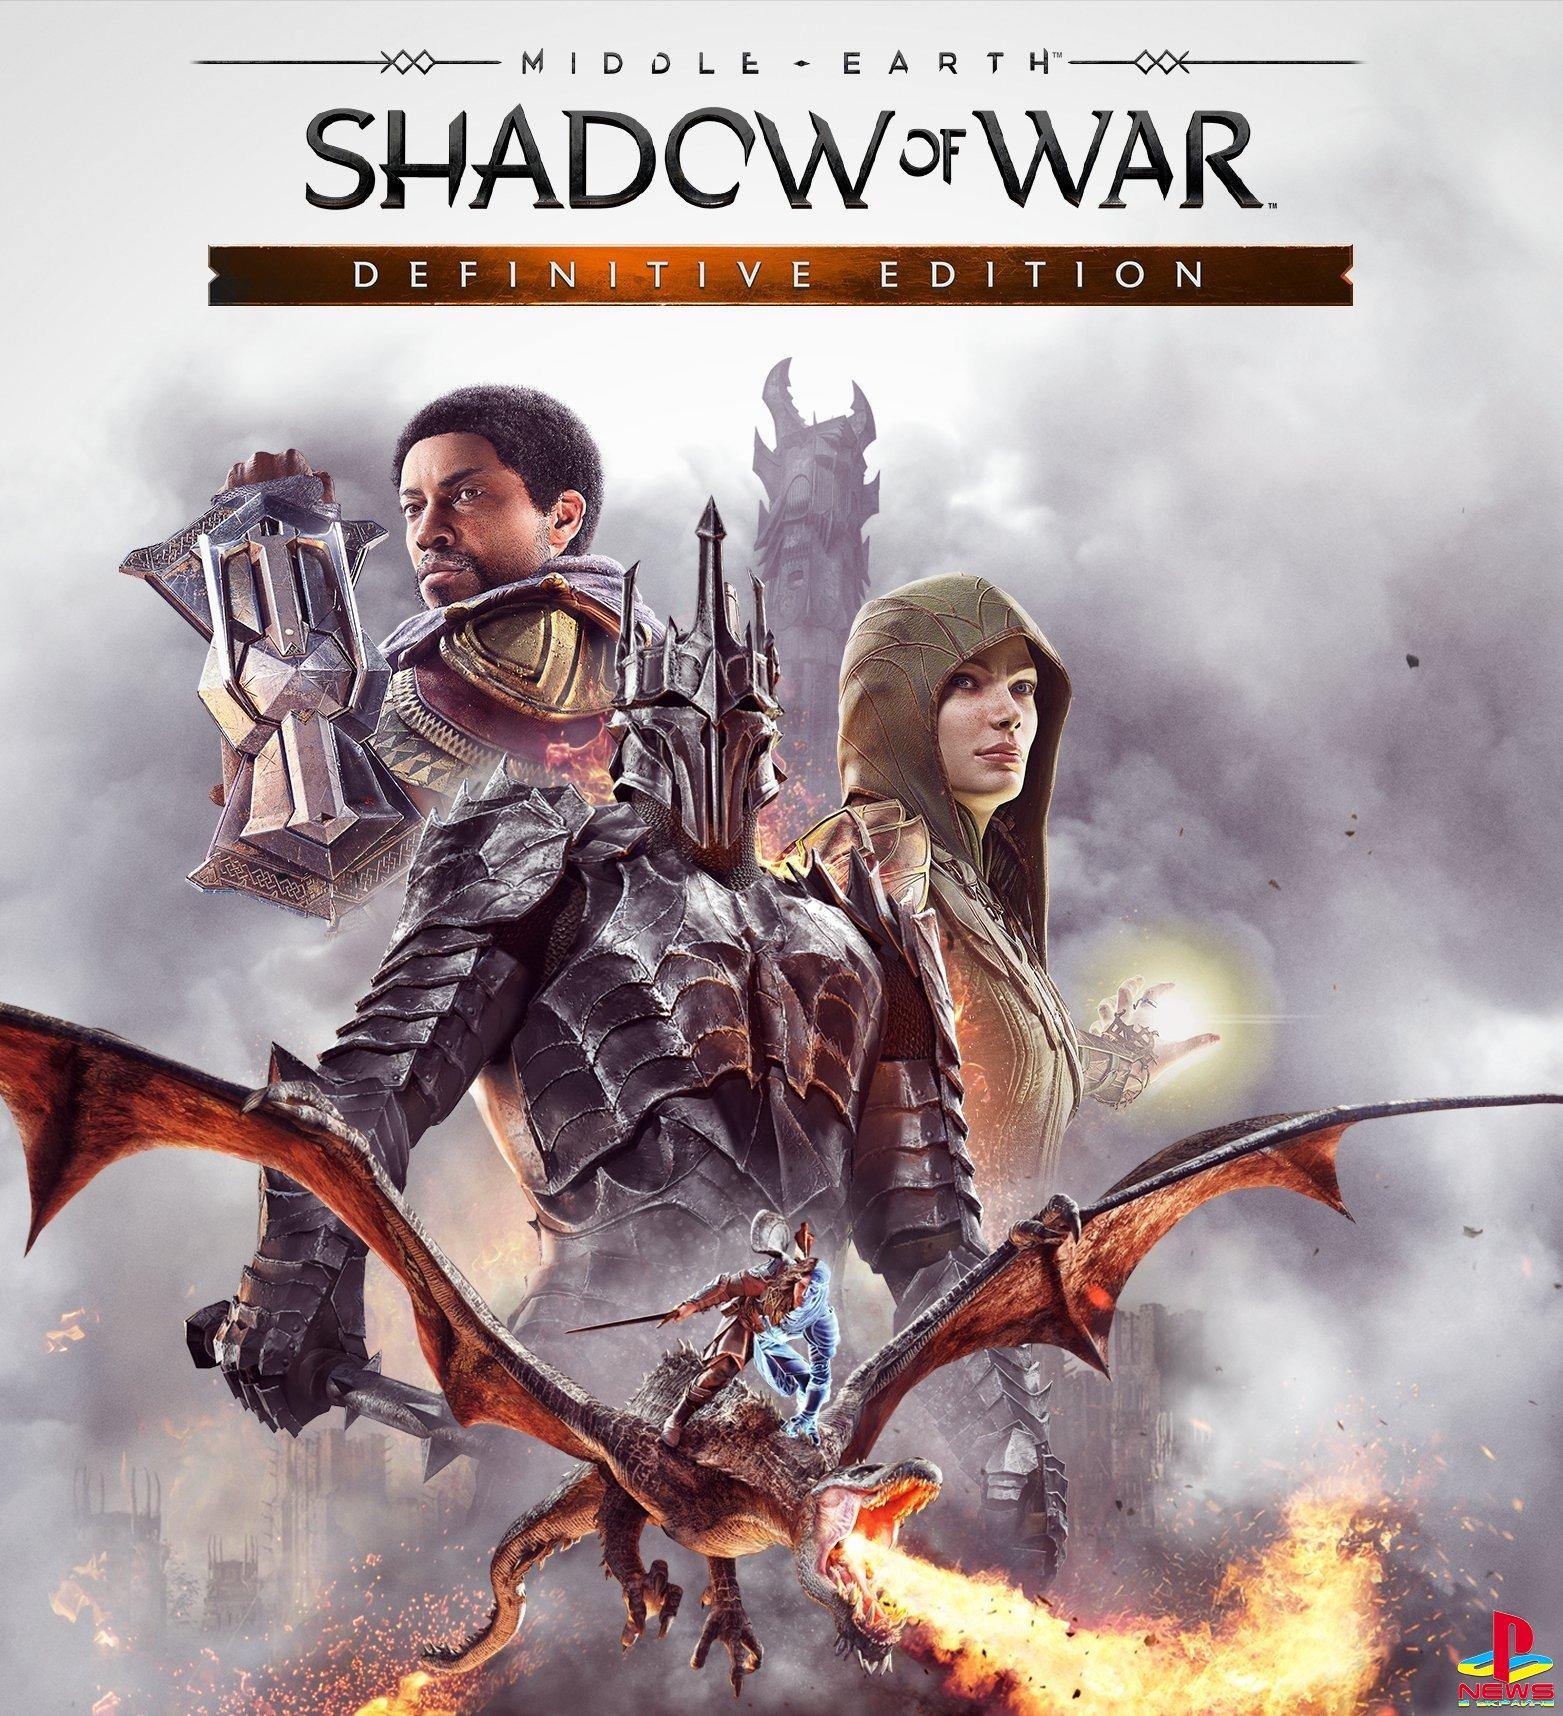 Middle-earth: Shadow of War - анонсировано полное издание игры